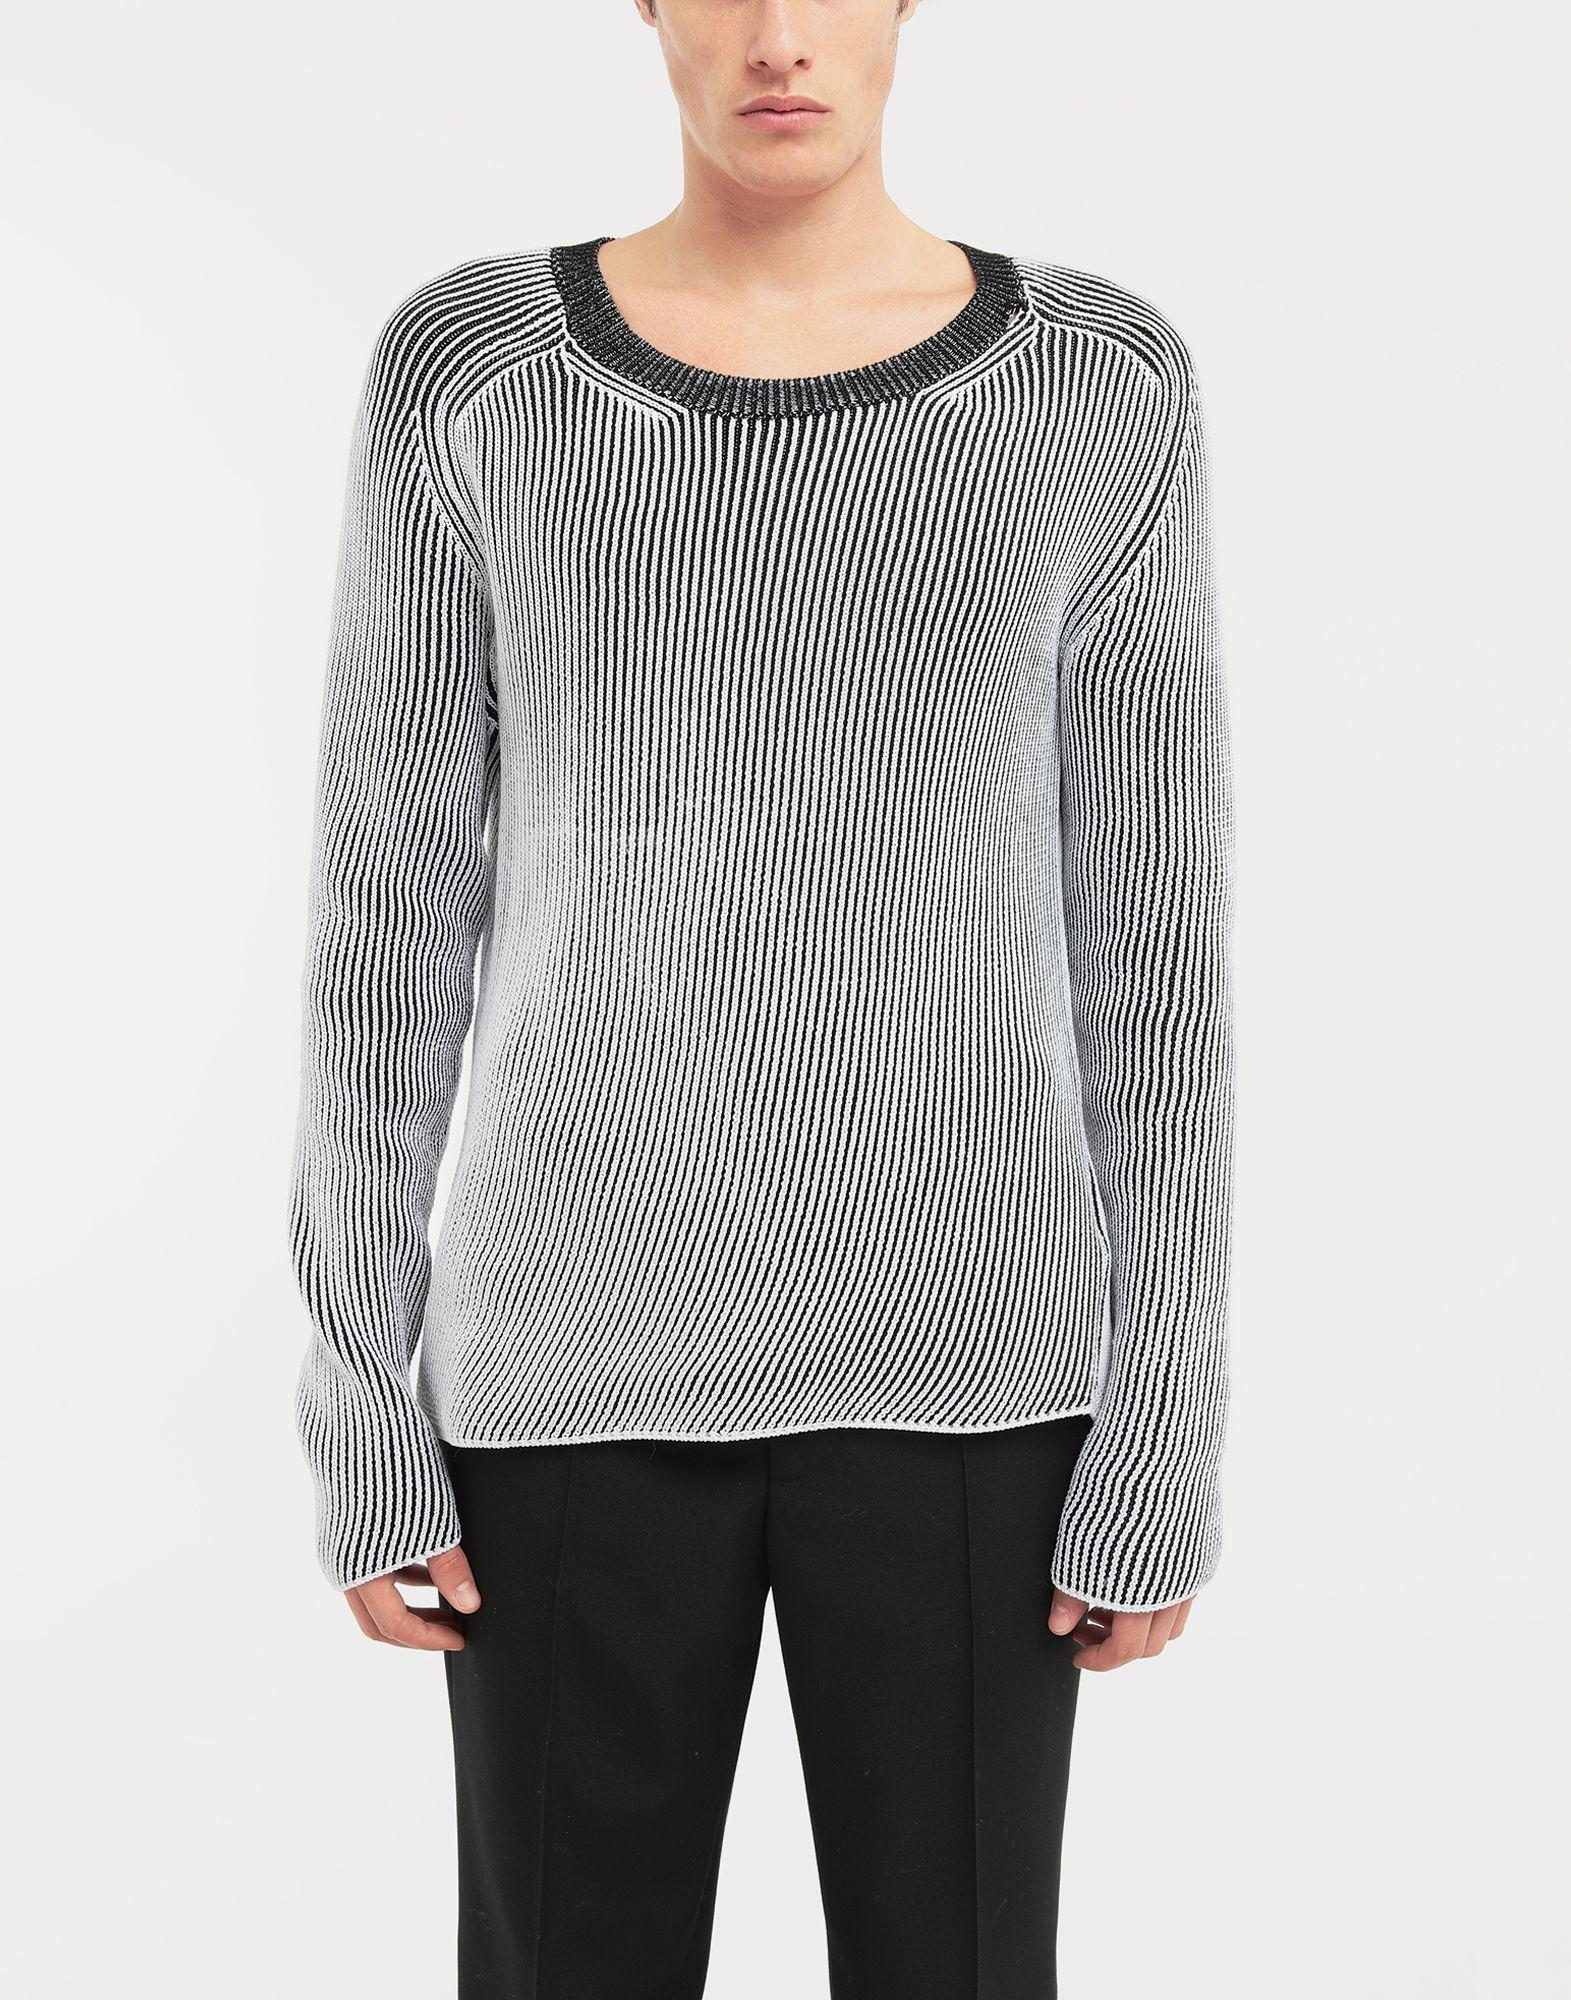 MAISON MARGIELA Cardigan knit pullover Crewneck sweater Man r